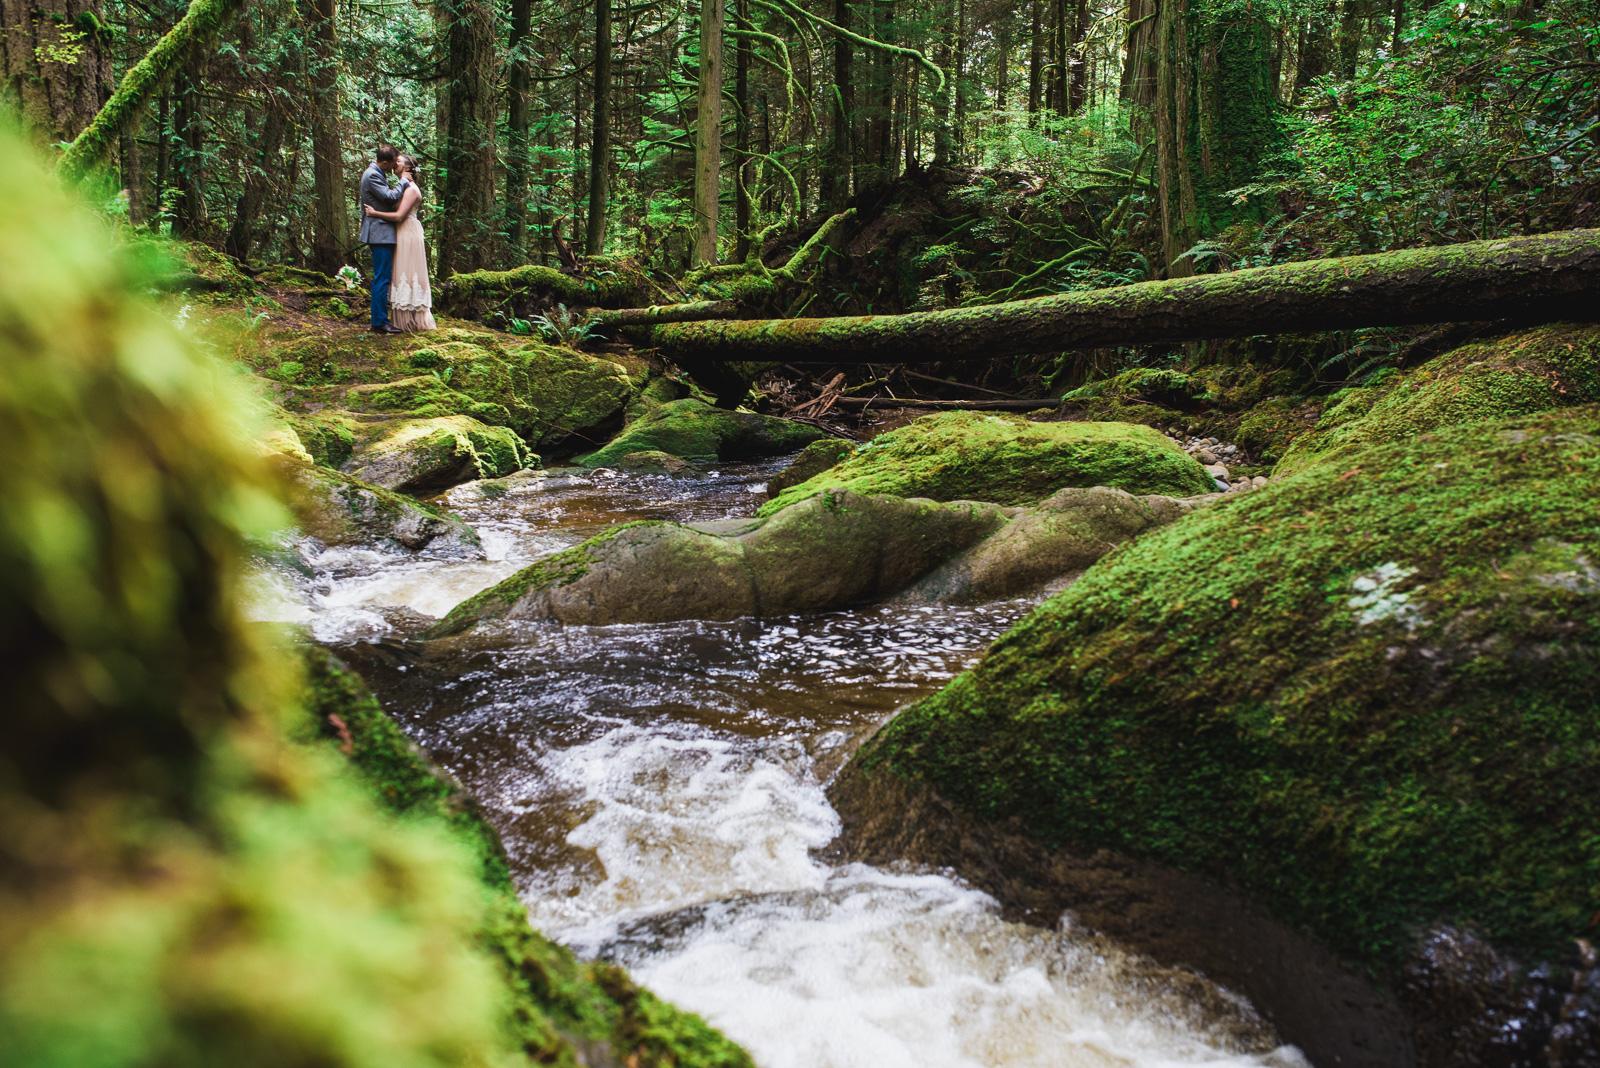 vancouver-island-wedding-photographers-cliff-gilker-park-smugglers-cove-elopement-14.jpg